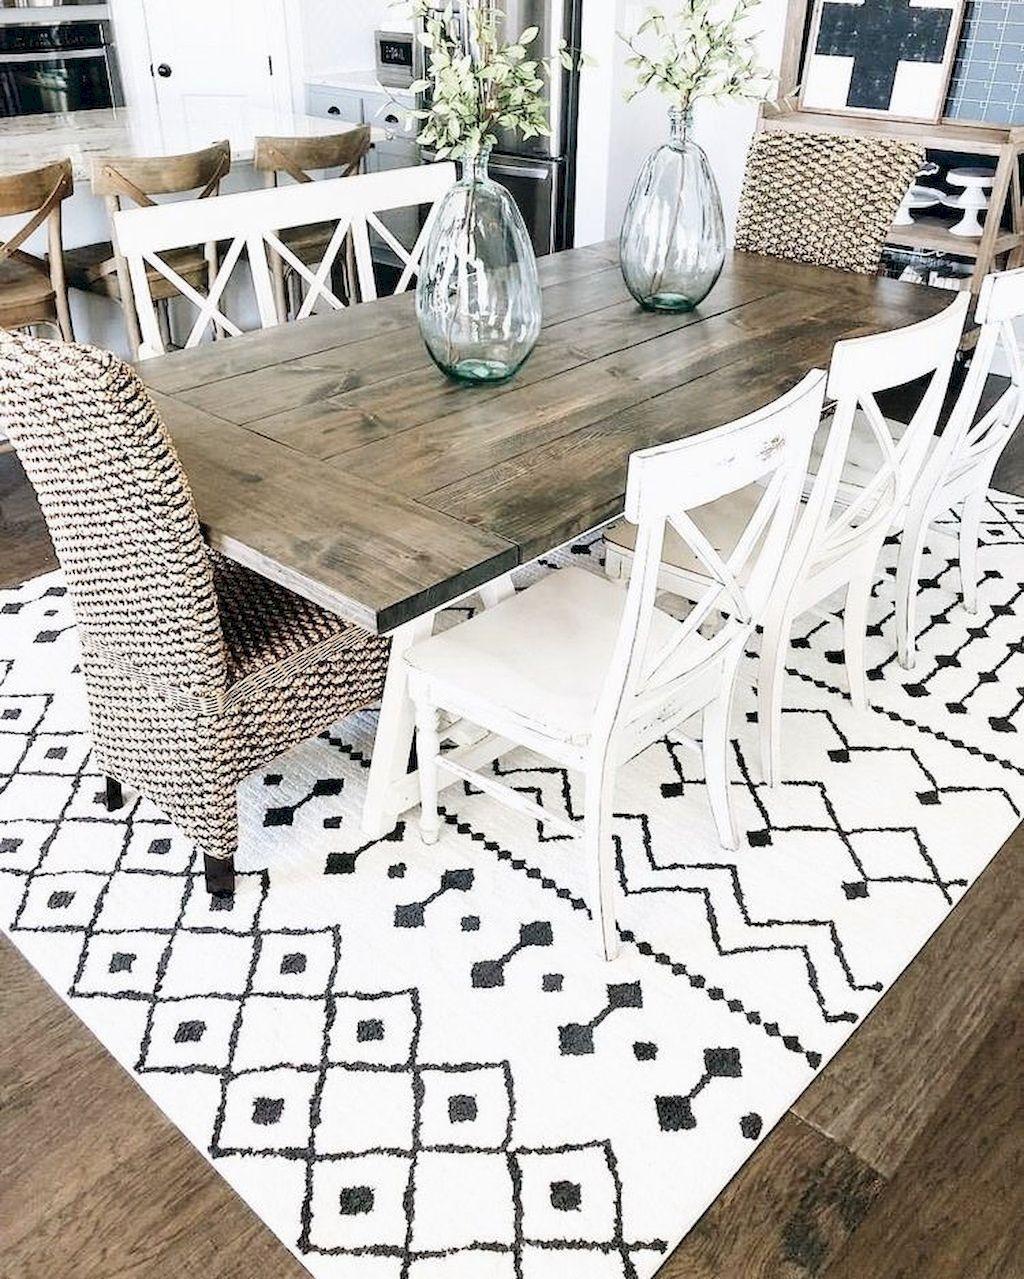 Popular Farmhouse Dining Room Design Ideas Trend 2019 24